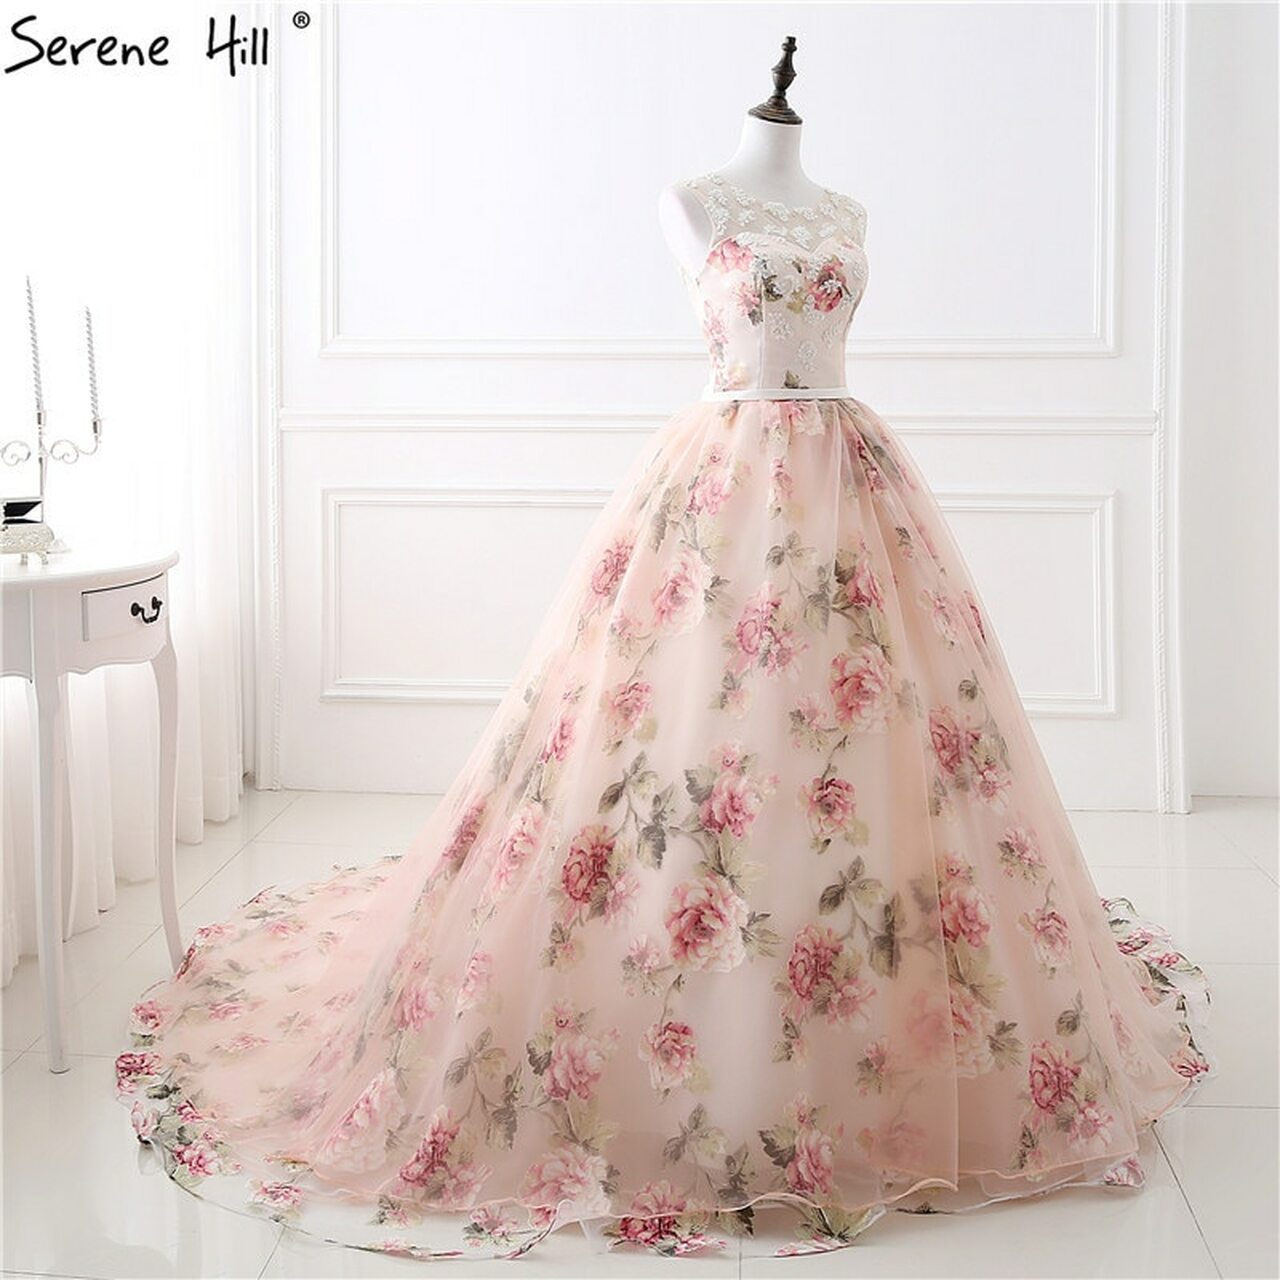 Romantic Flowers Pattern Fashion Sexy Wedding Dress Sleeveless